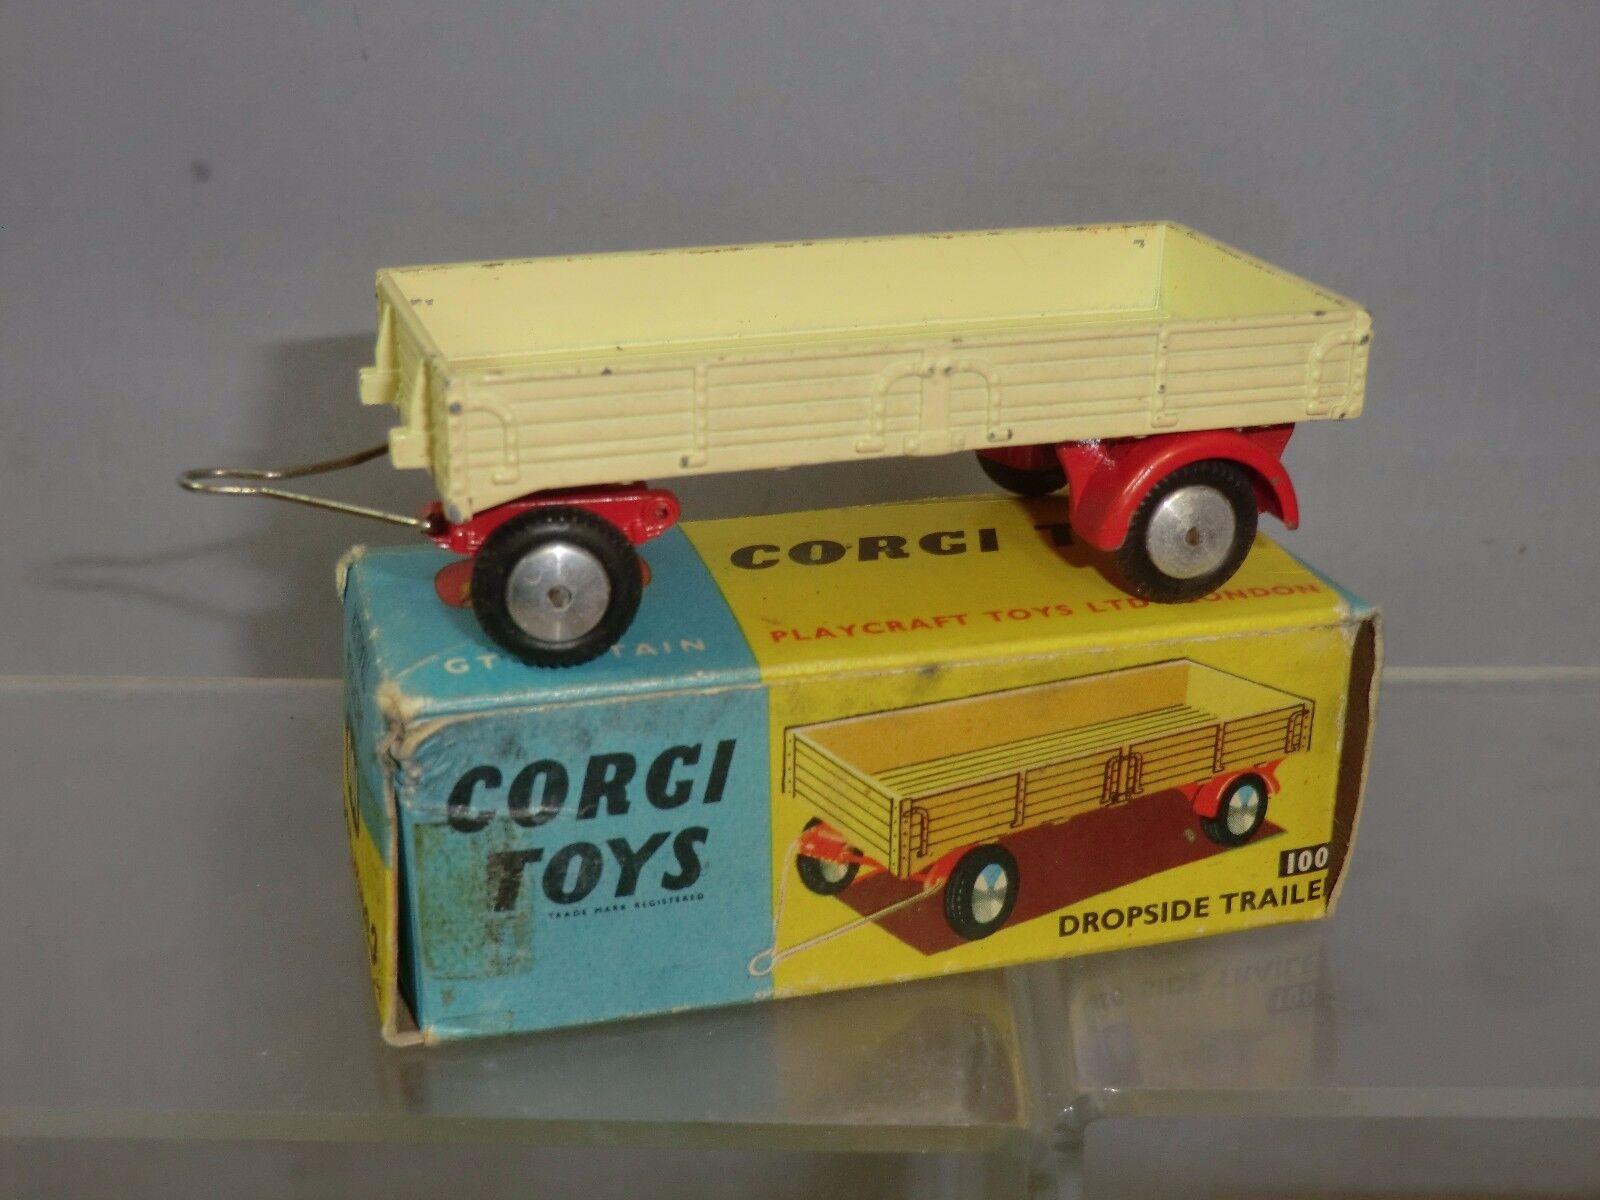 Corgi spielzeug modell no.100 dropside wohnwagen im mib